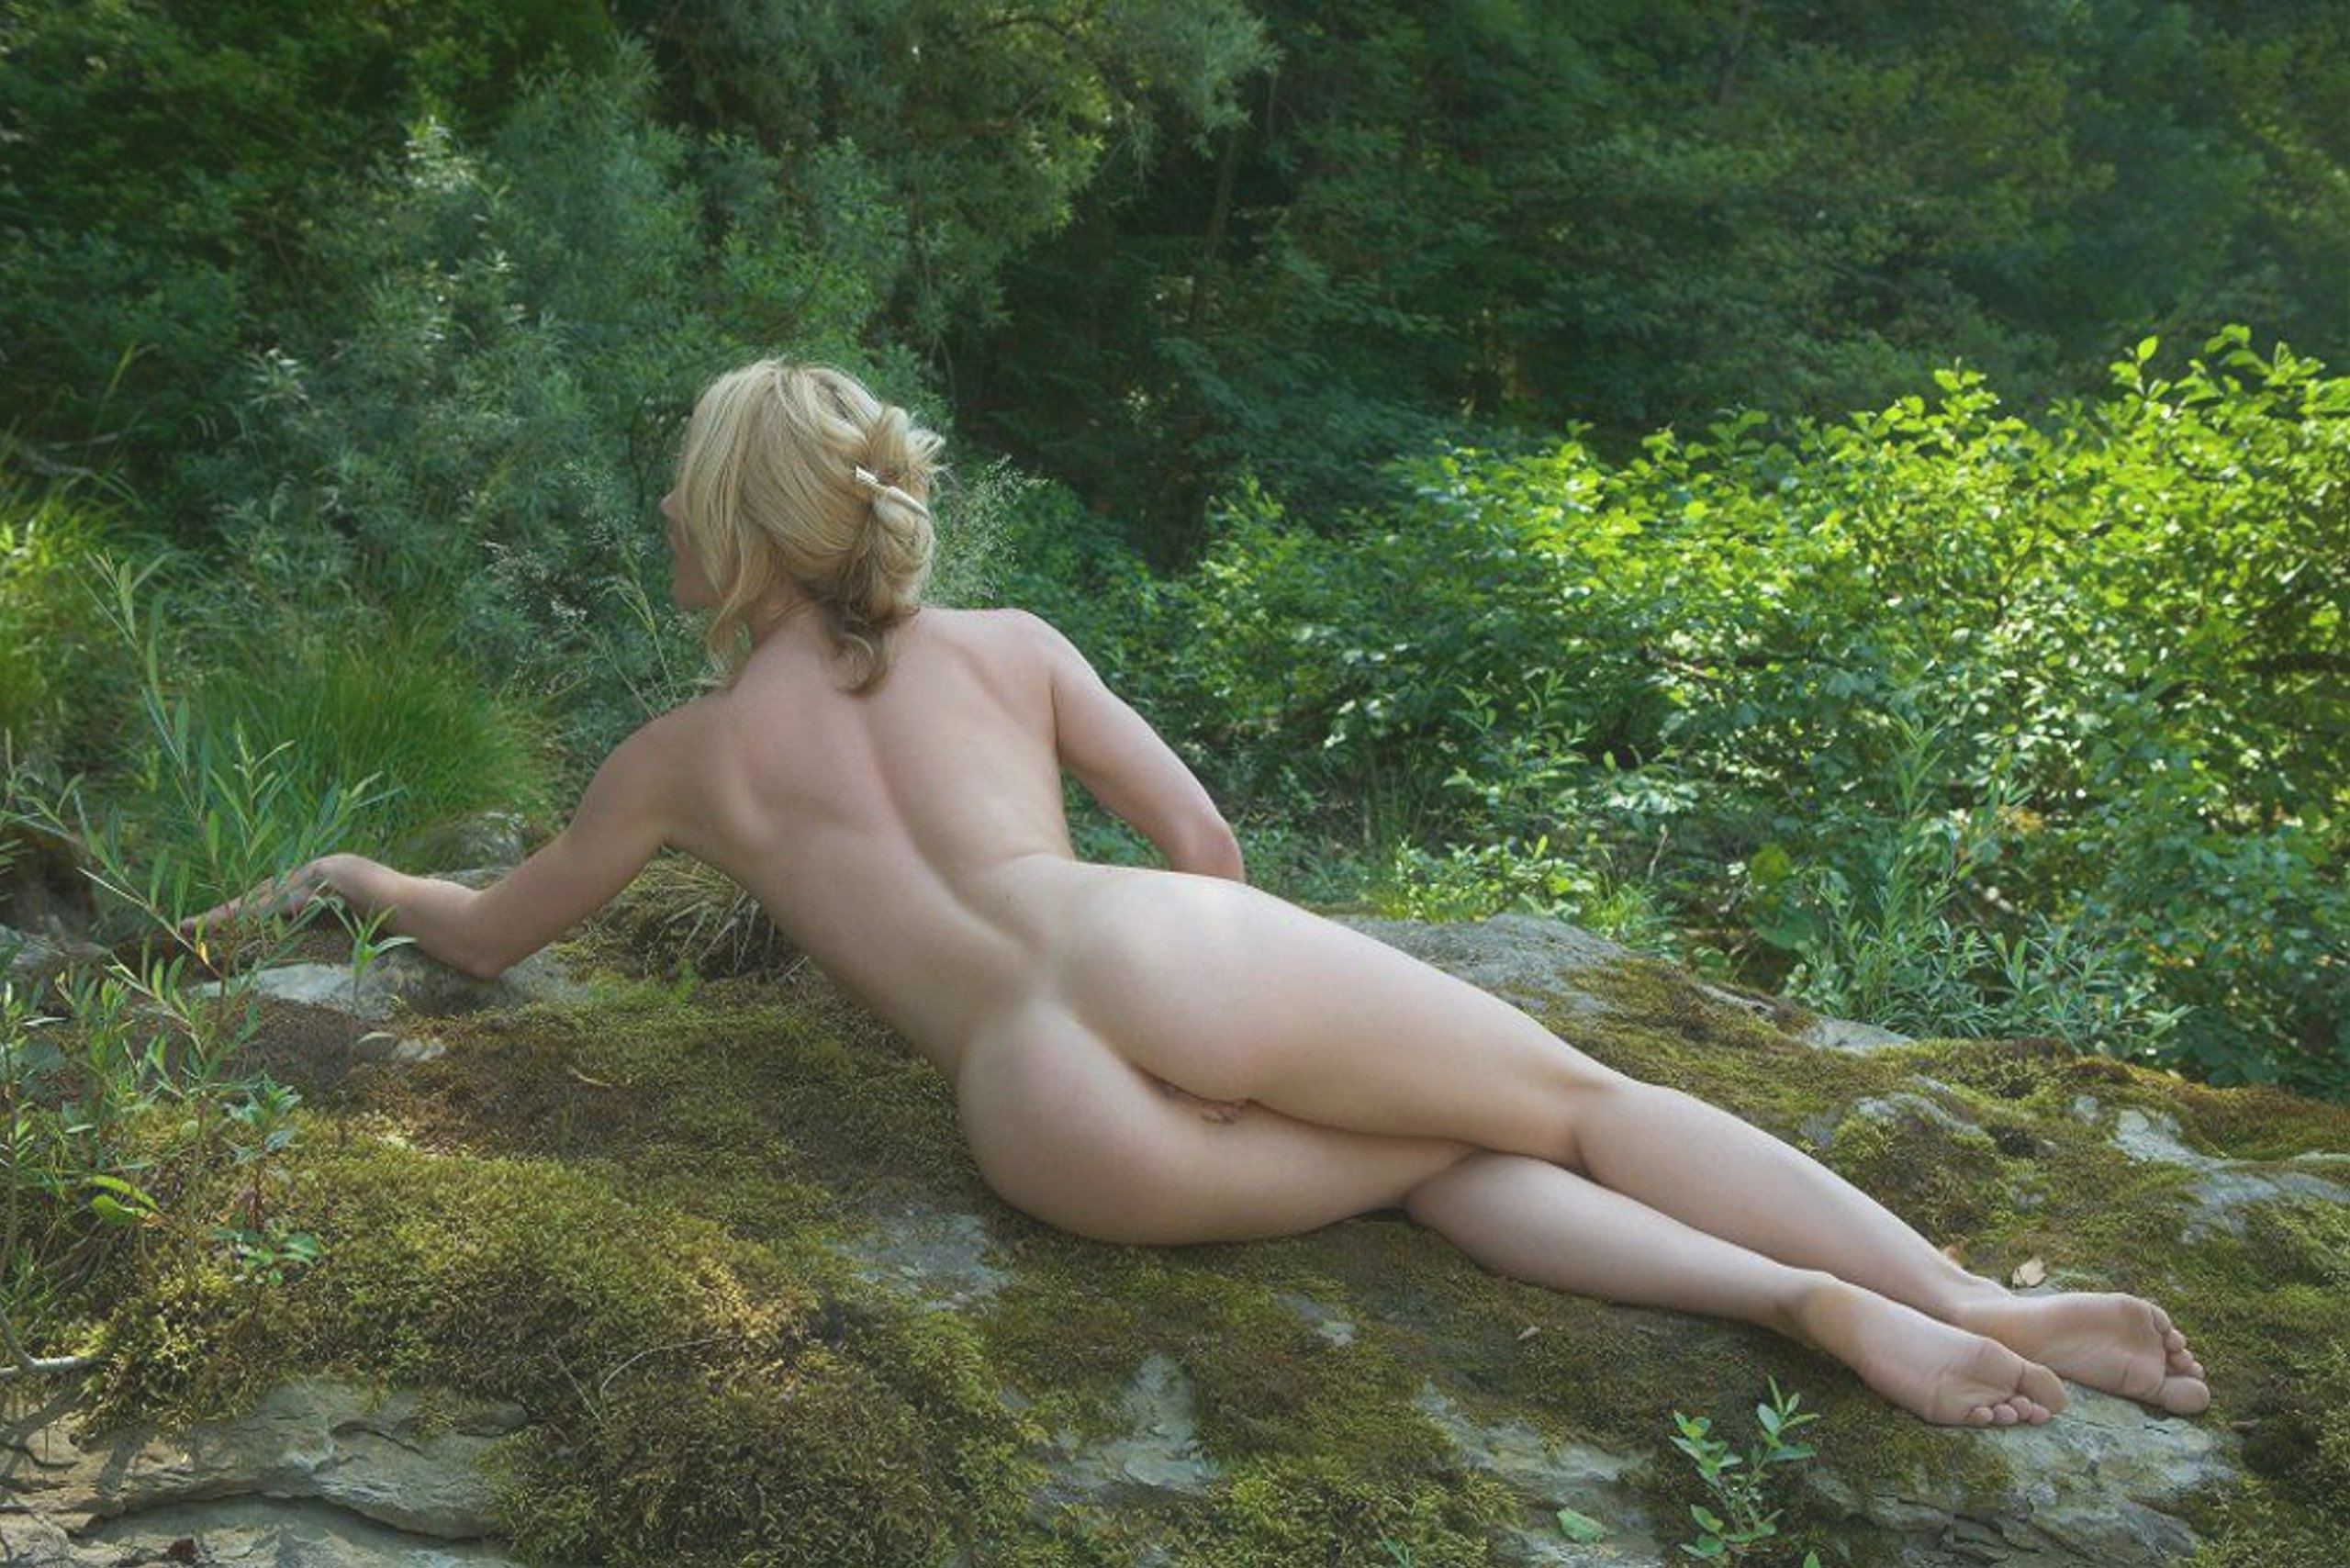 Naked outdoors pics, big boobs tattooed girl having sex